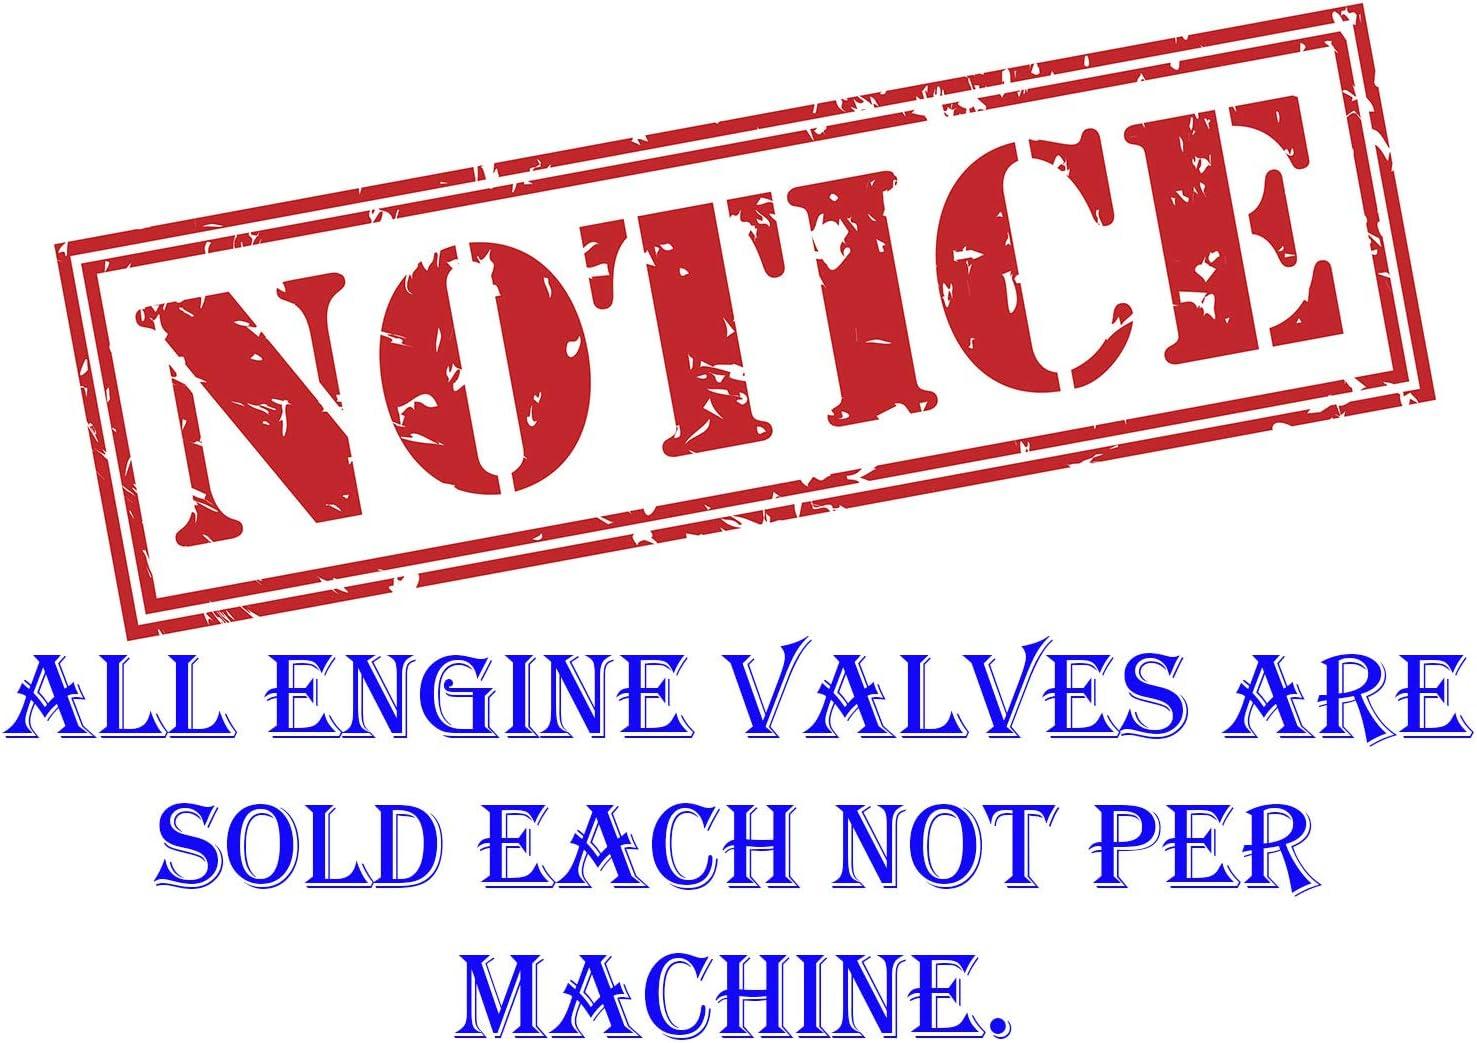 Exhaust Valve Bellow Fits 1985 Polaris 600 SE